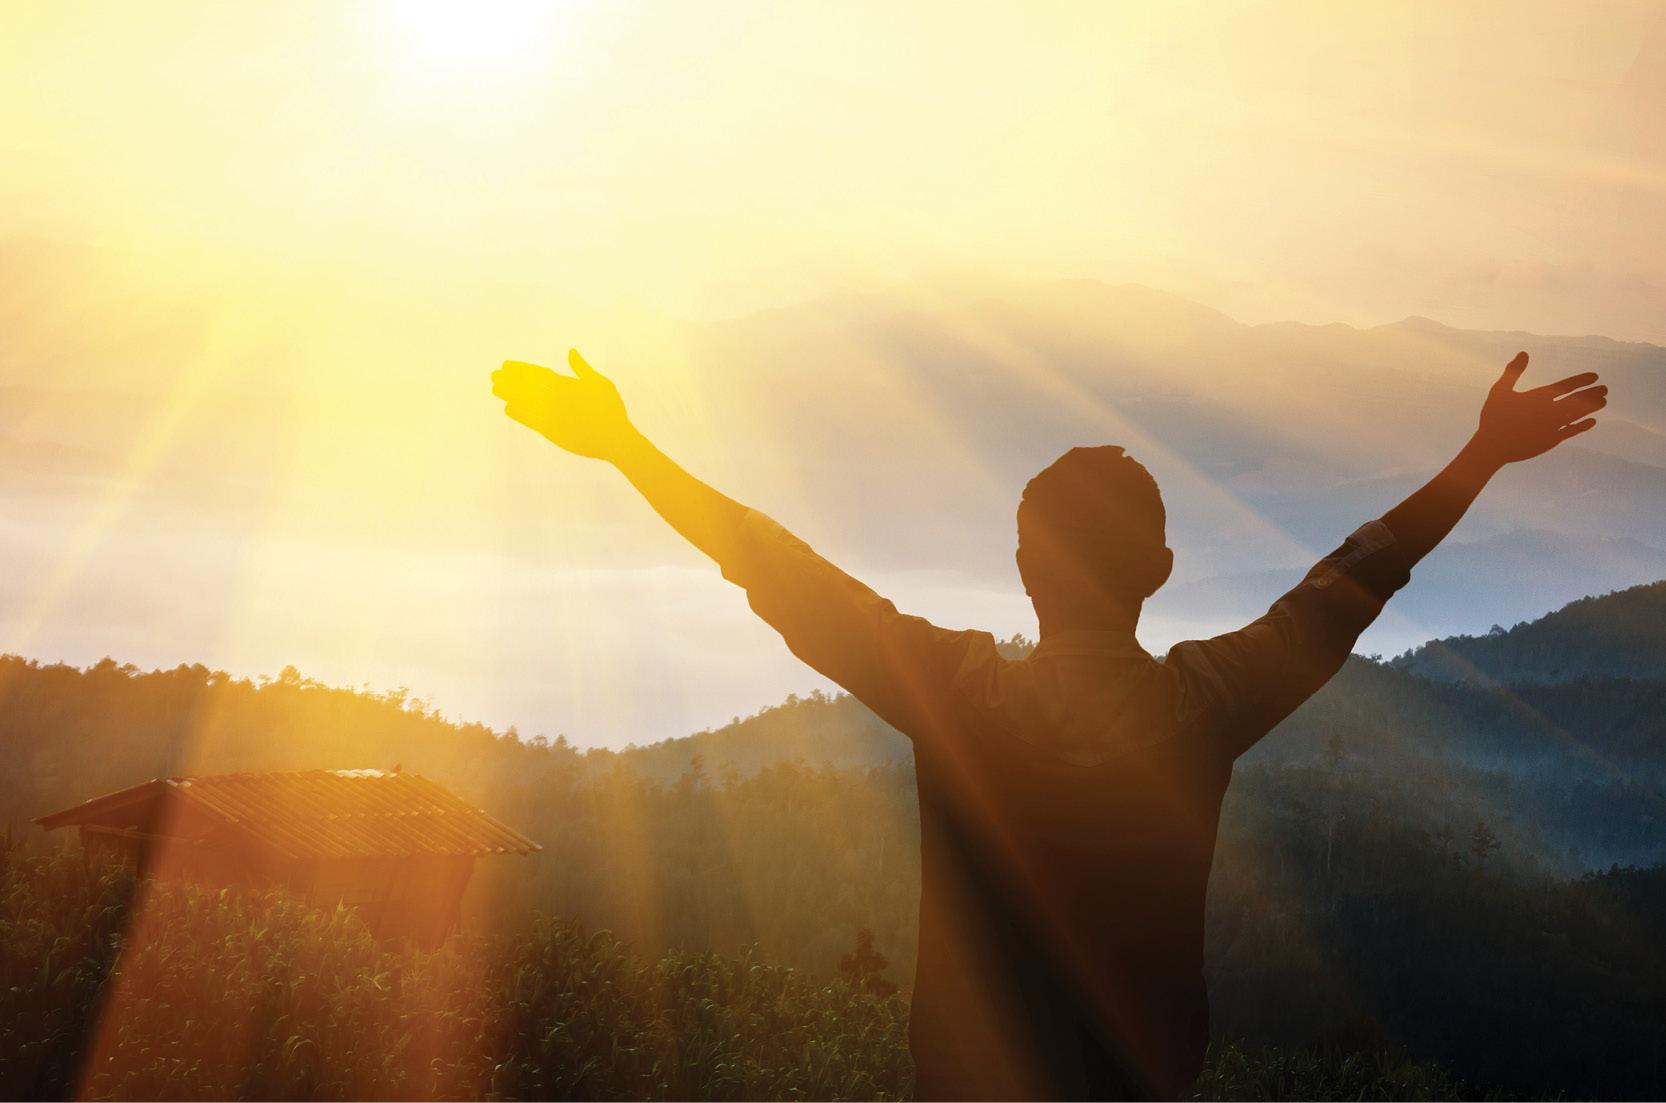 Spiritual Re-Evaluation